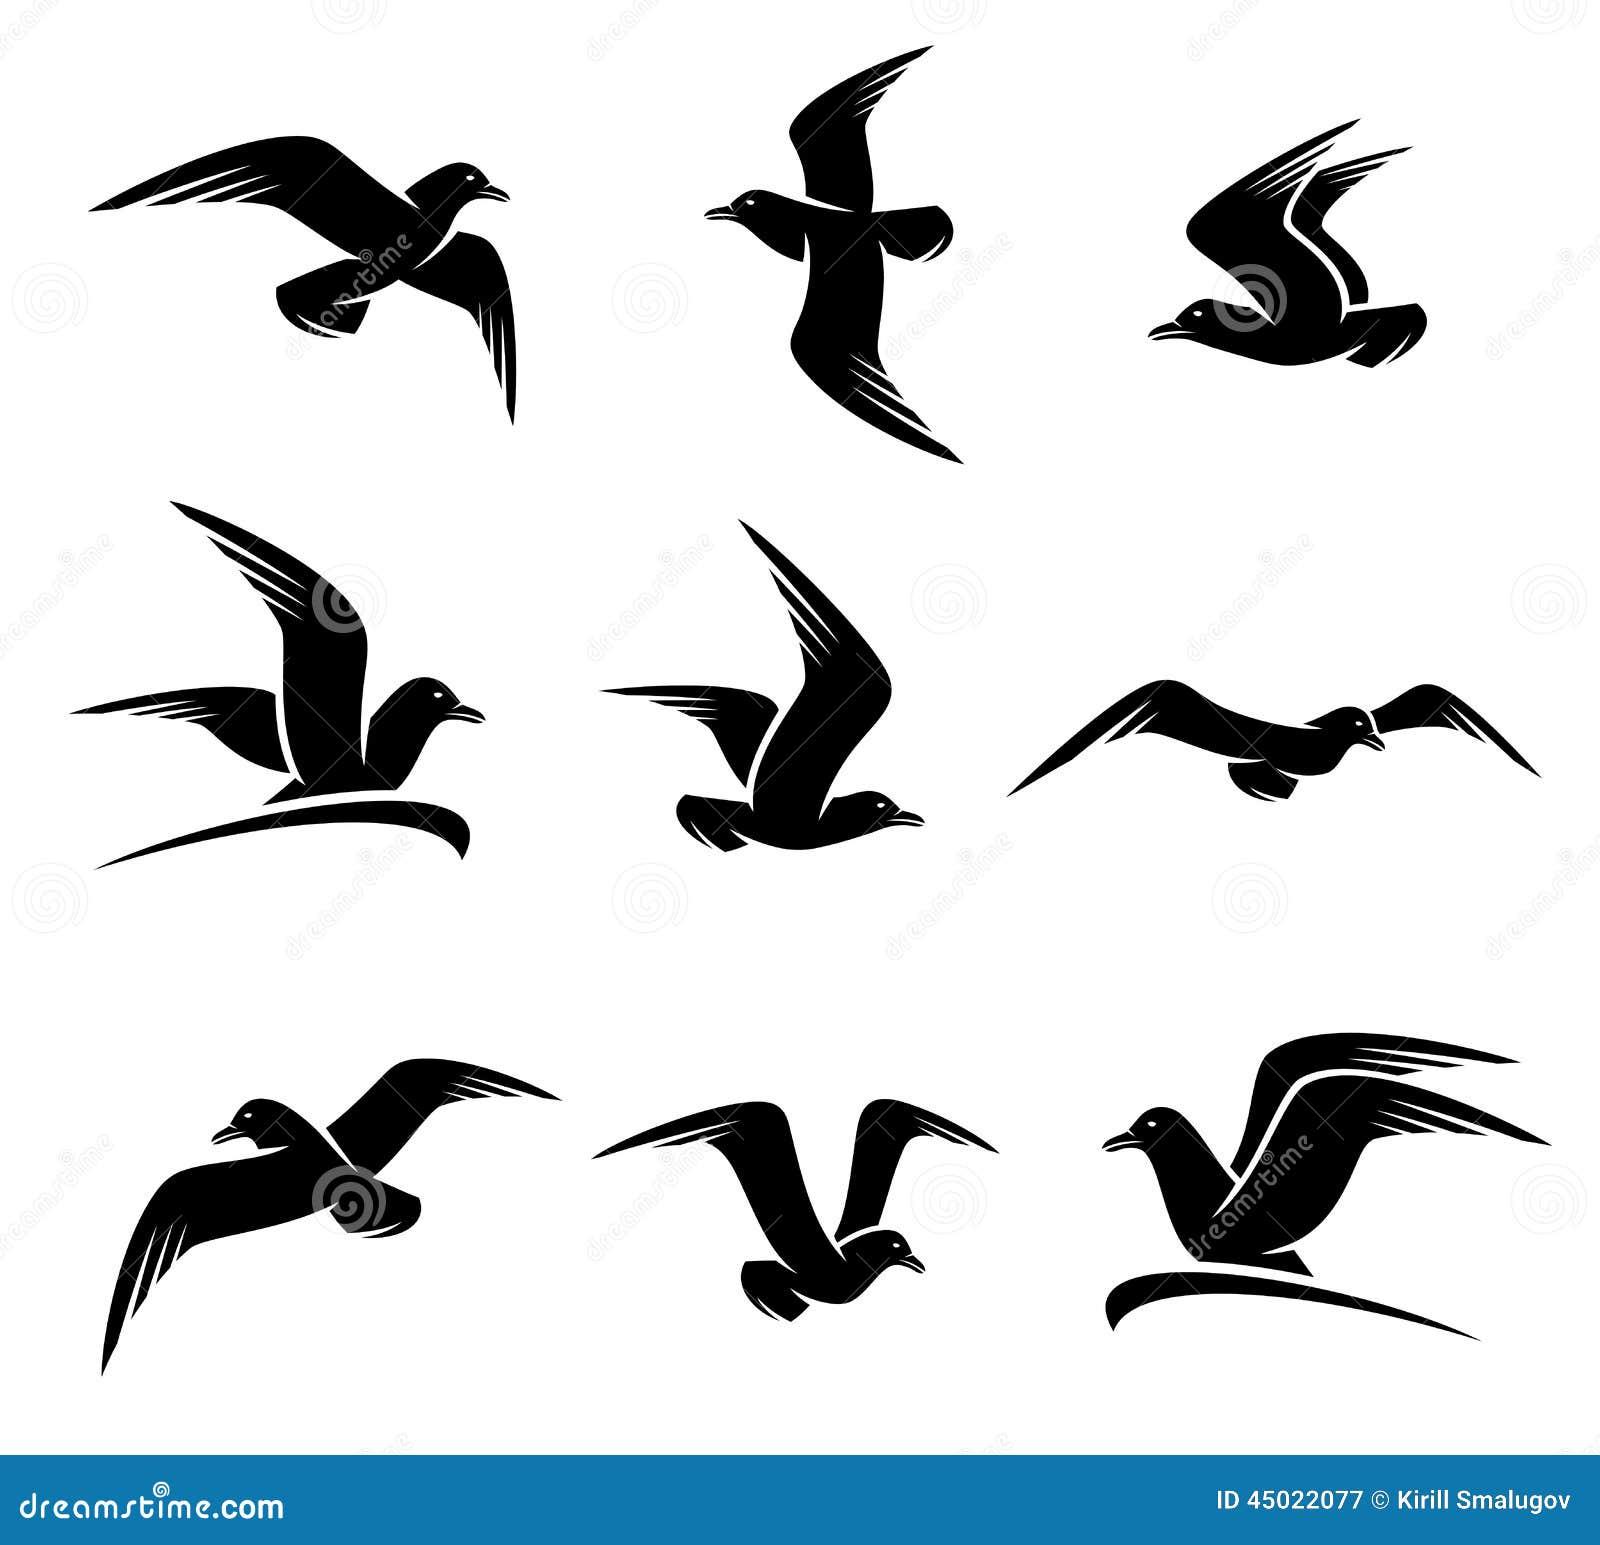 flying seagull stock illustrations u2013 1 218 flying seagull stock